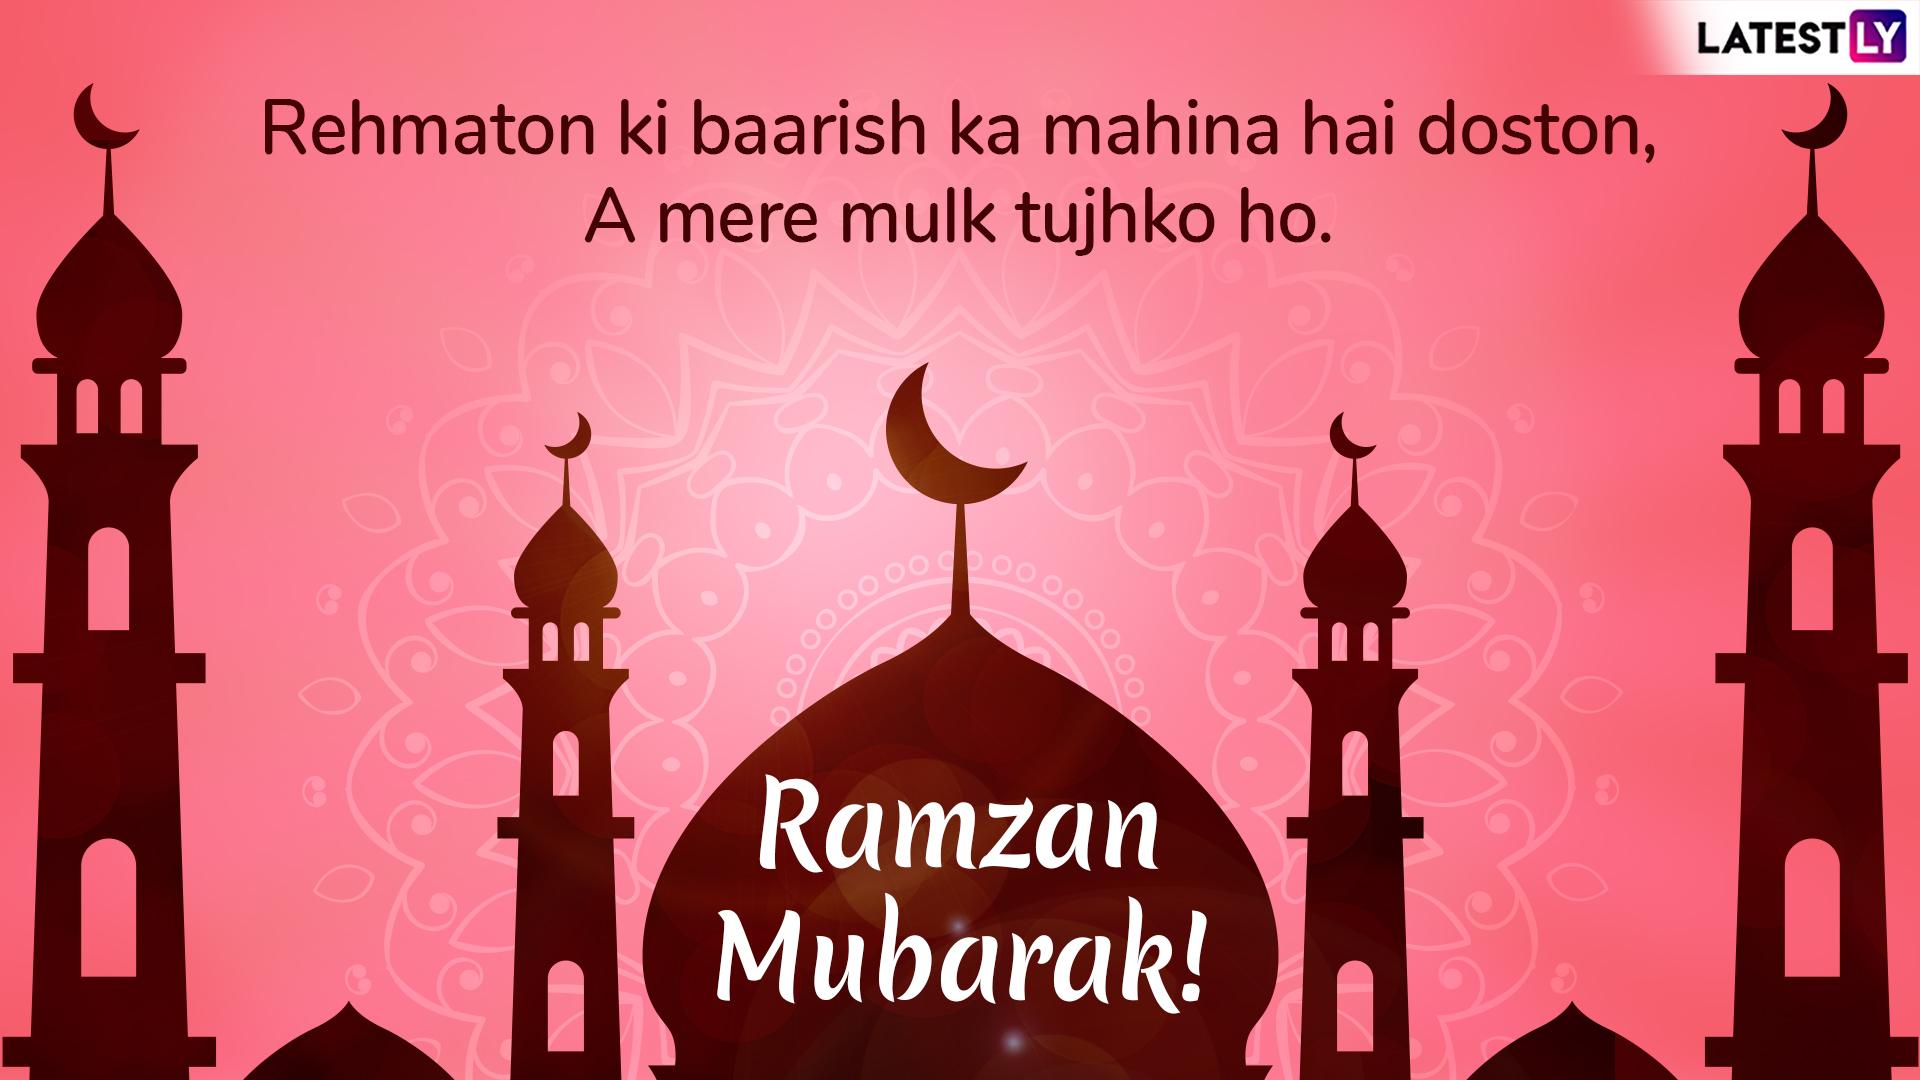 Ramzan mubarak messages and greetings